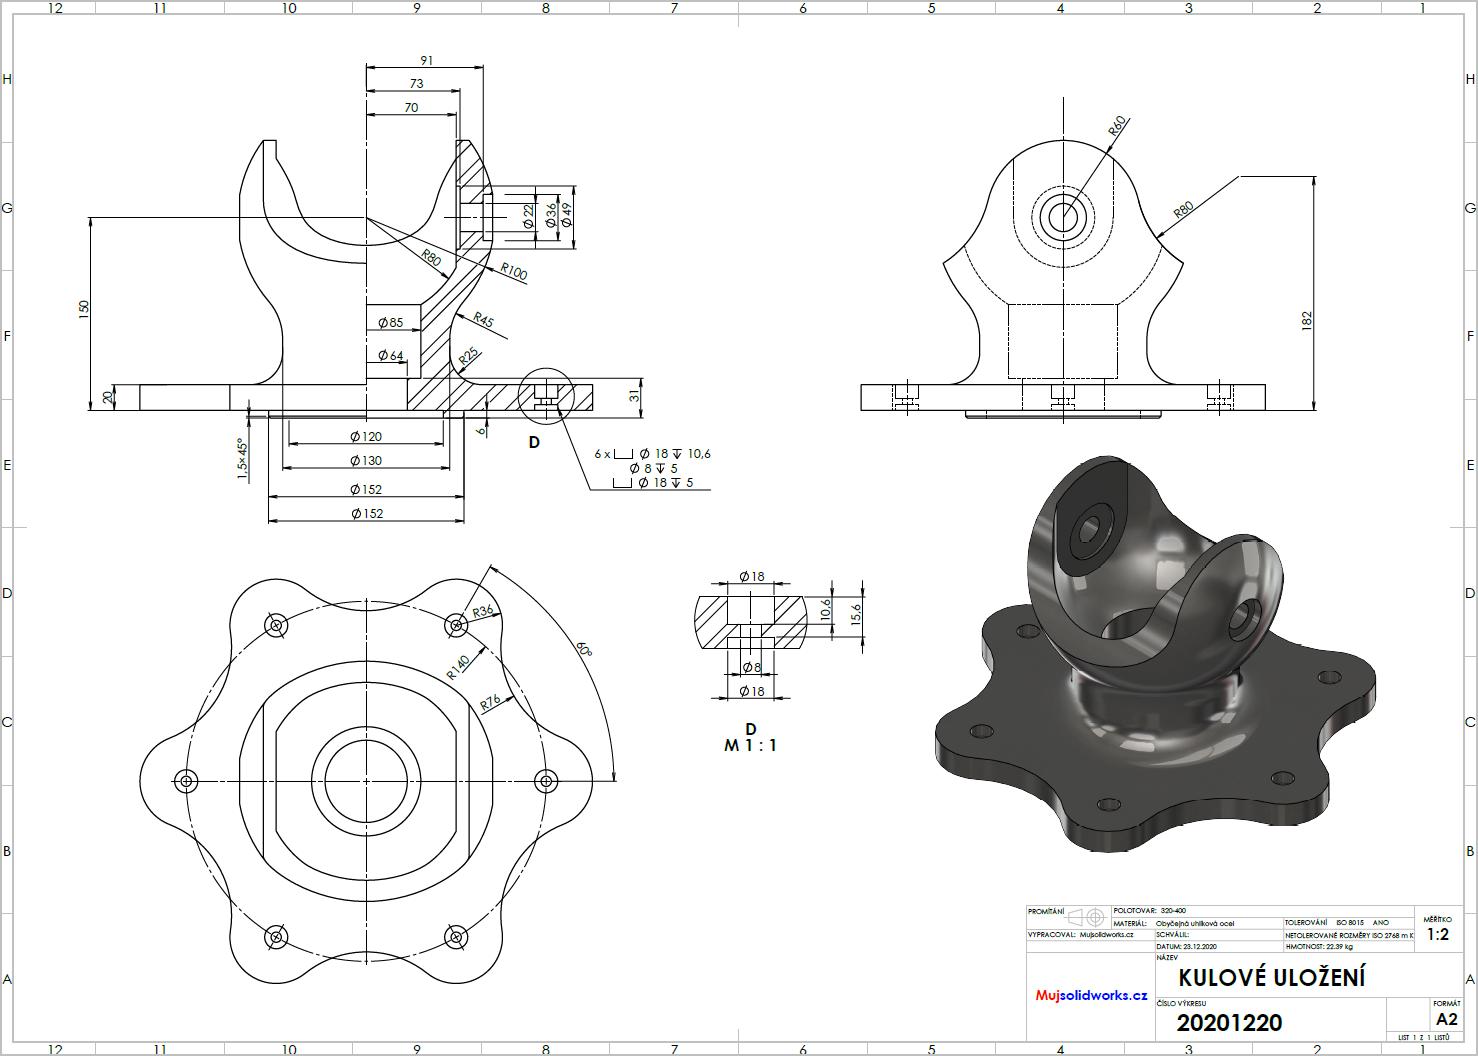 135-SOLIDWORKS-postup-modelovani-navod-pokrocily-advance-tutorial-kulove-ulozeni-sphere